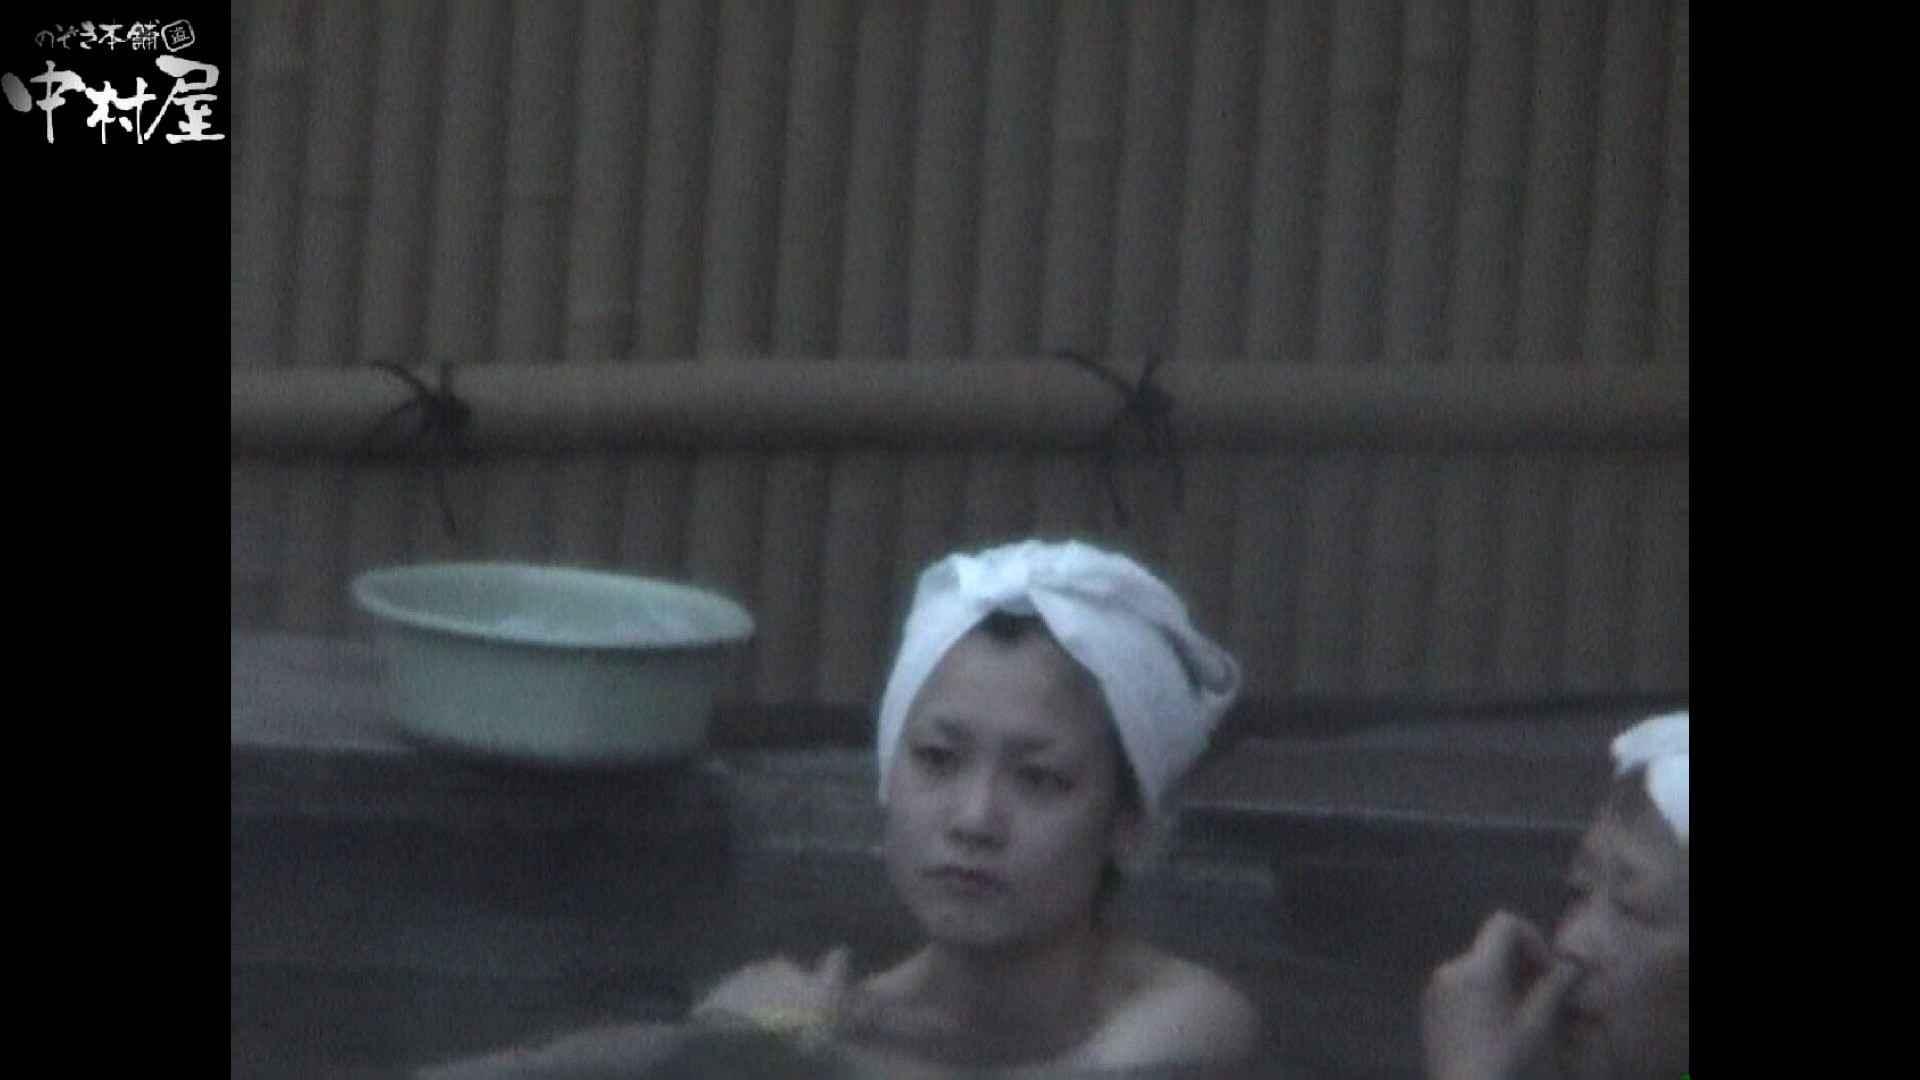 Aquaな露天風呂Vol.924 OLのエロ生活 オメコ動画キャプチャ 62連発 11